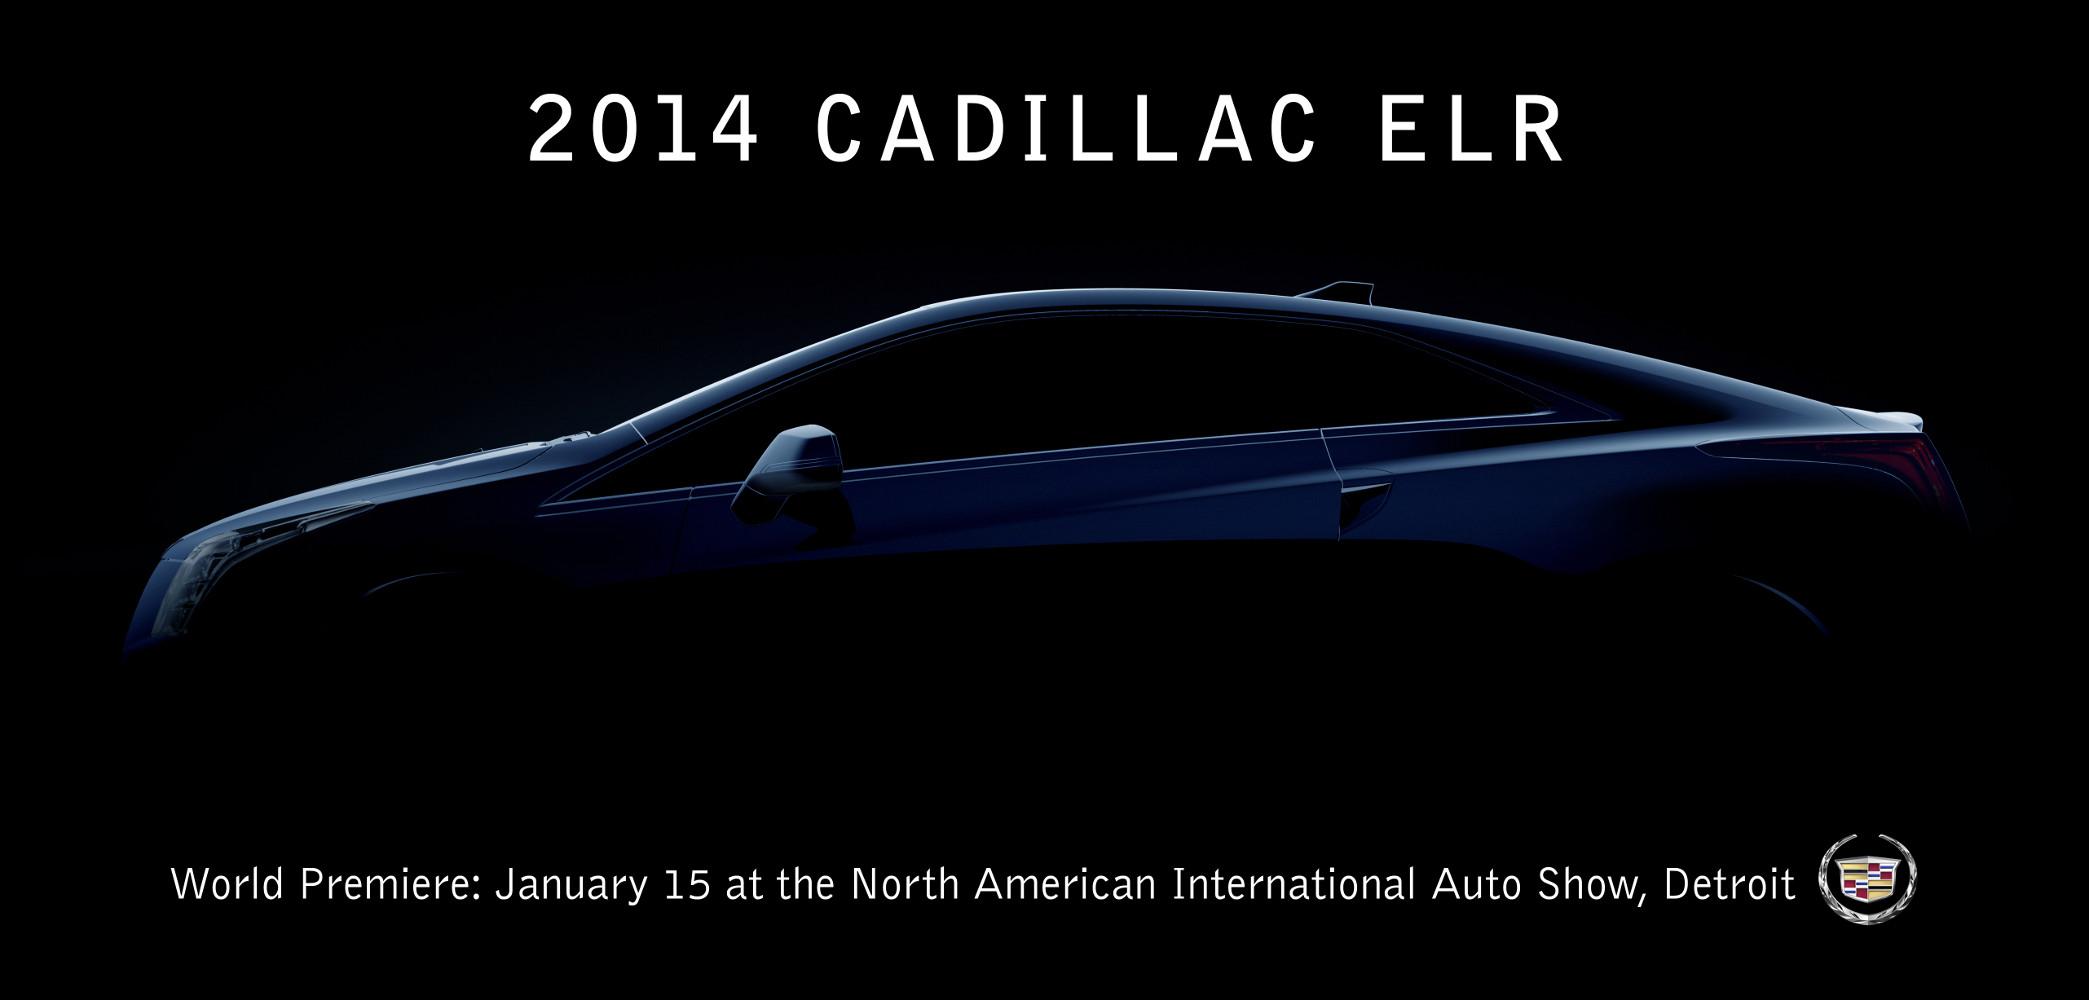 Cadillac ELR Teaser, Weltpremiere in Detroit